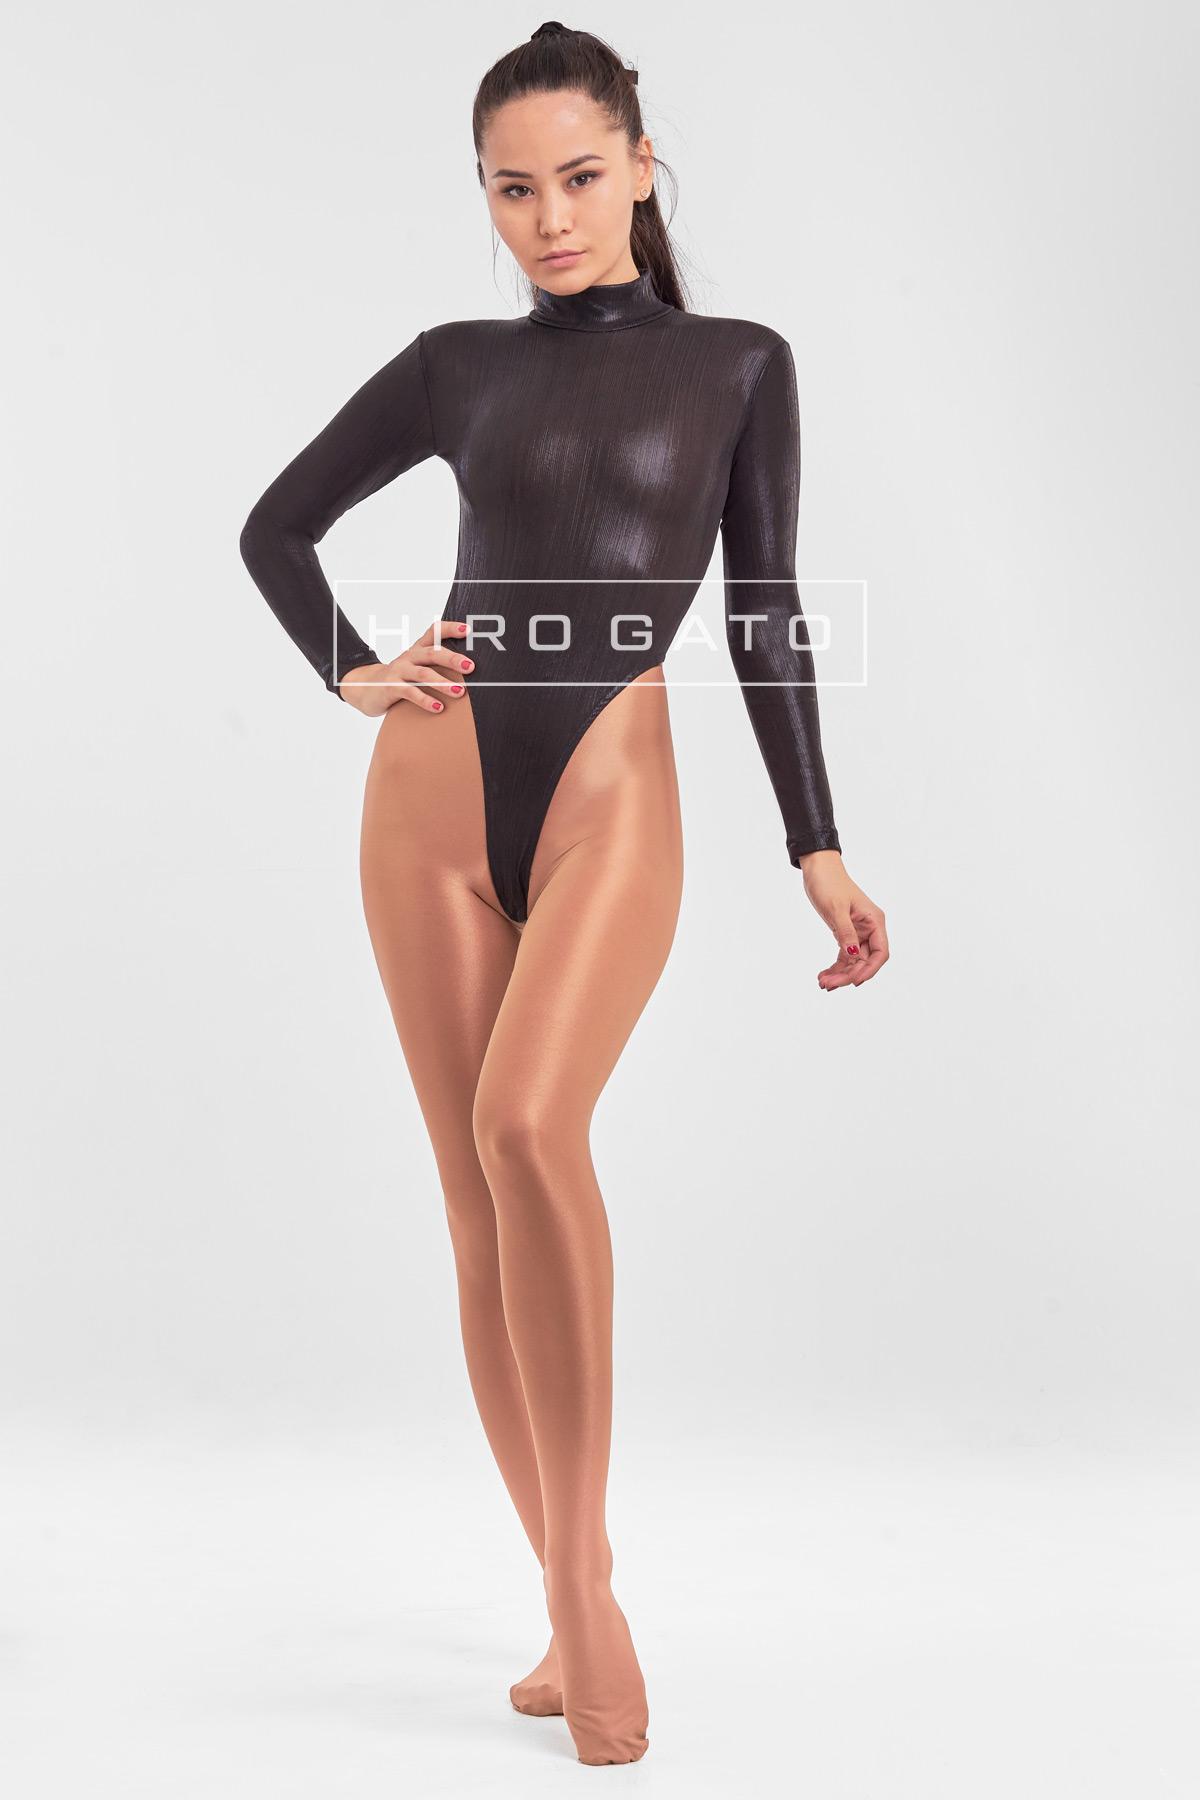 High Leg Leotard Black Shiny Metallic Lycra Spandex